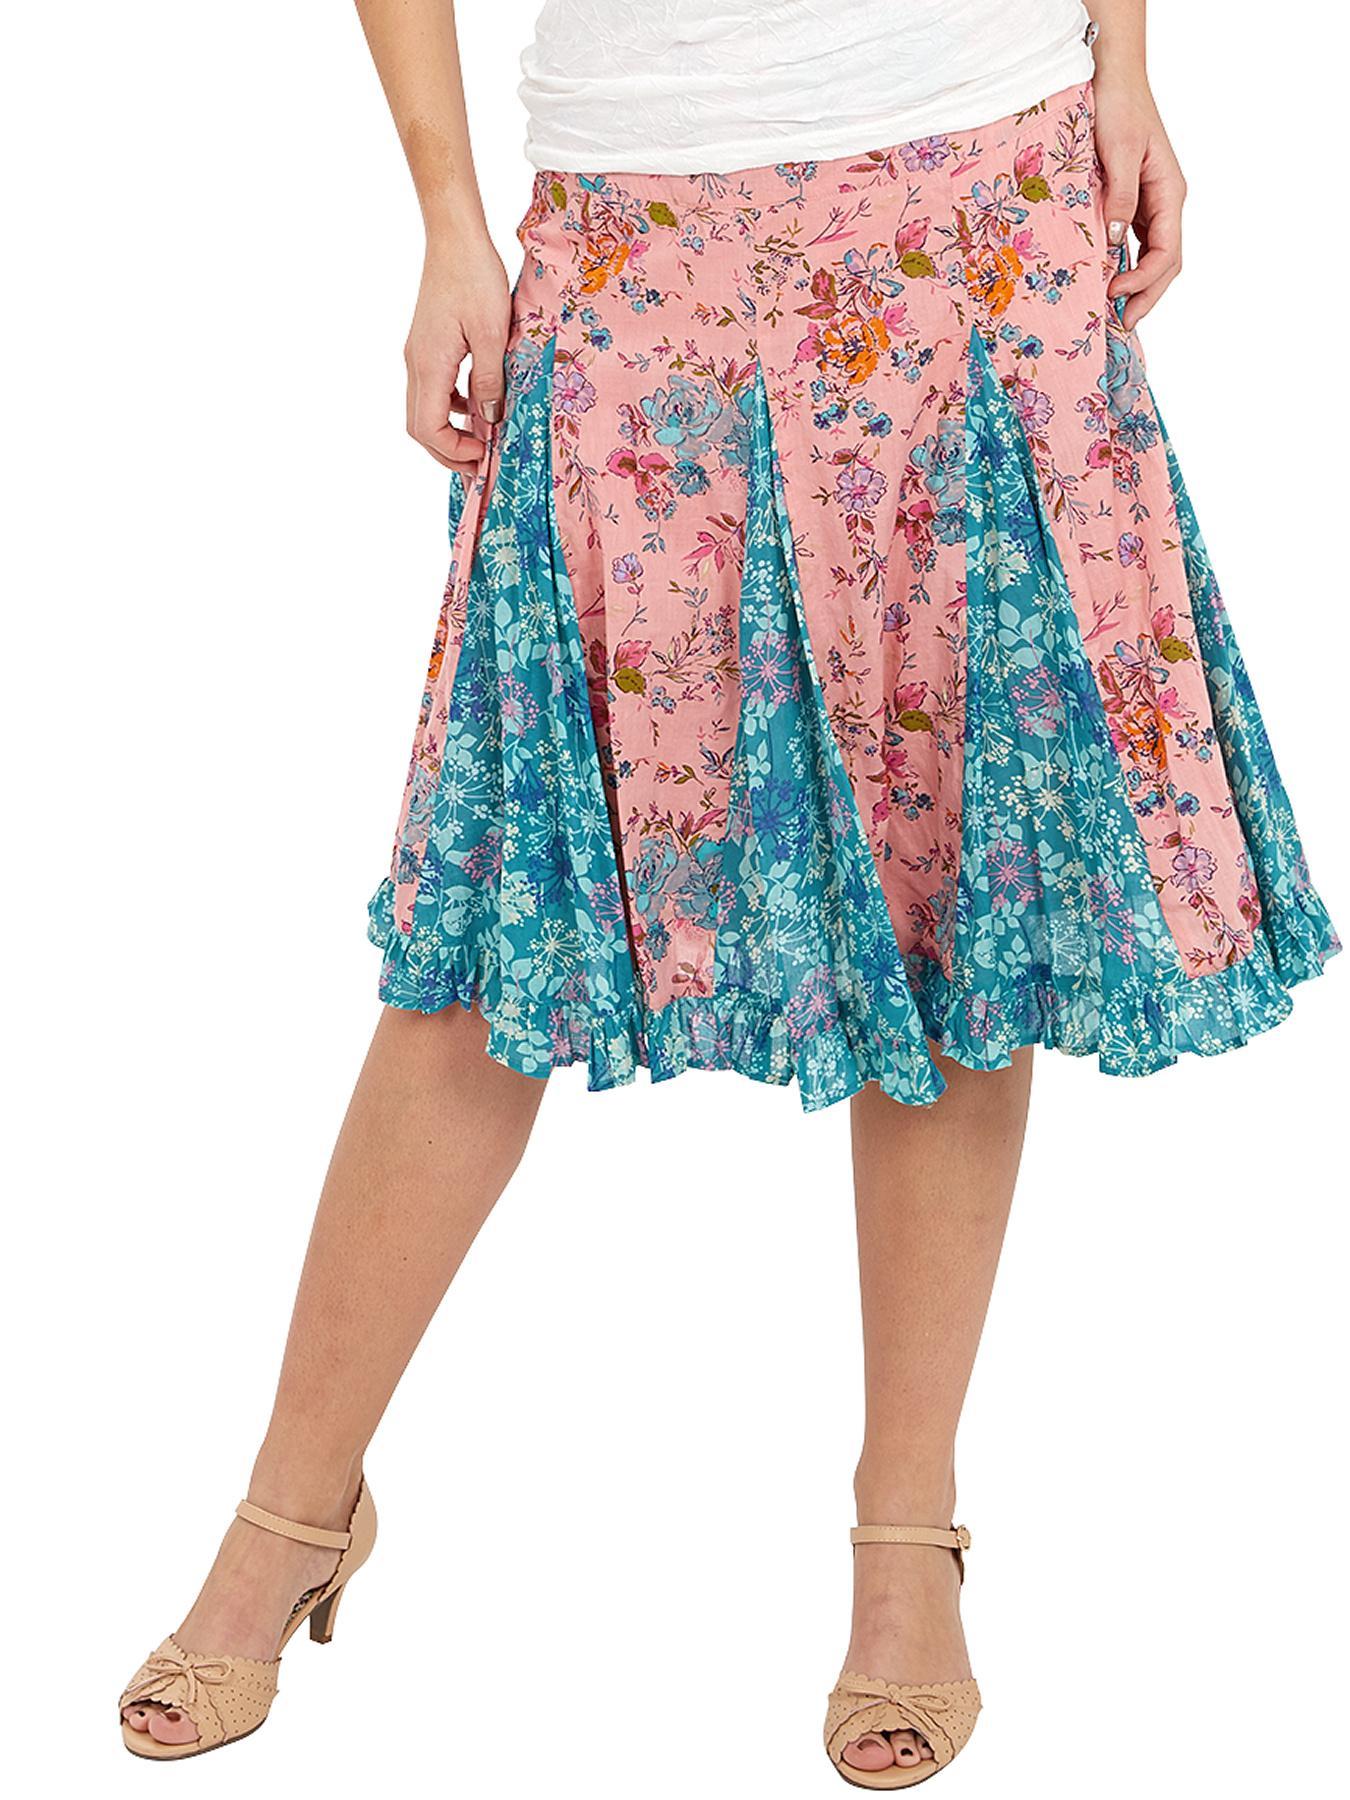 Joe Browns Glorious Godet Skirt - Pink, Pink